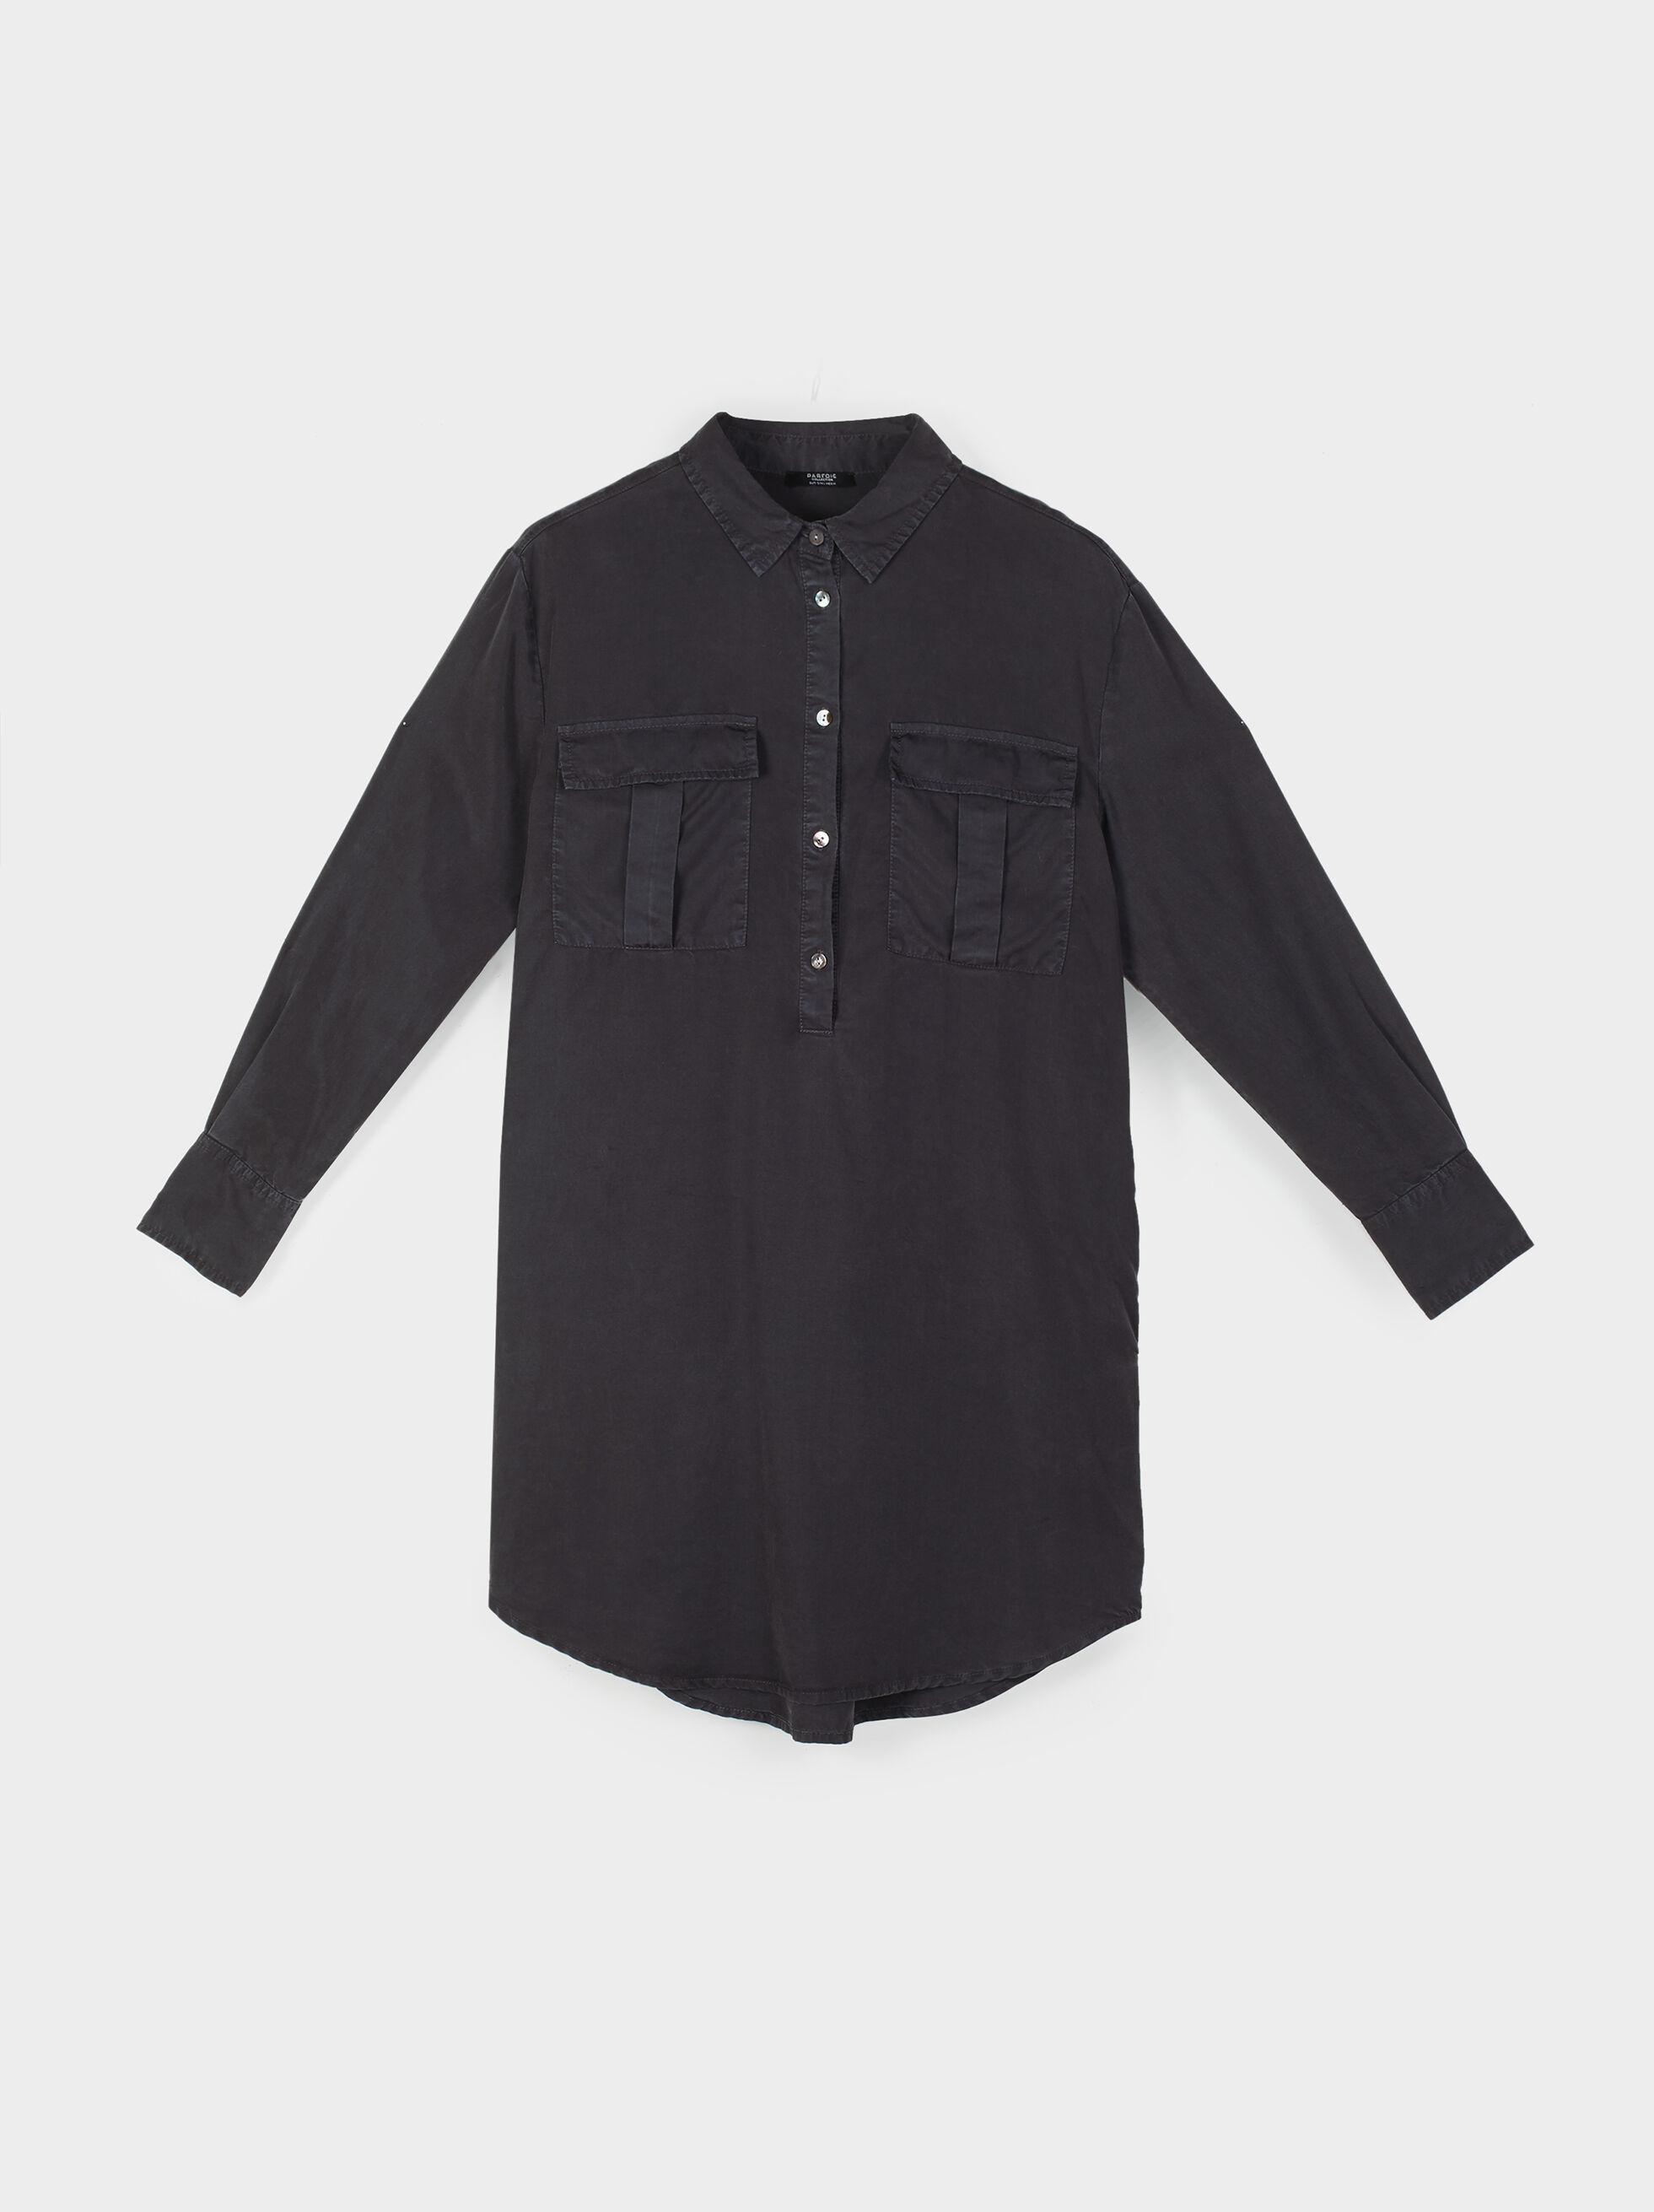 Shirt Dress With Button Details, Grey, hi-res